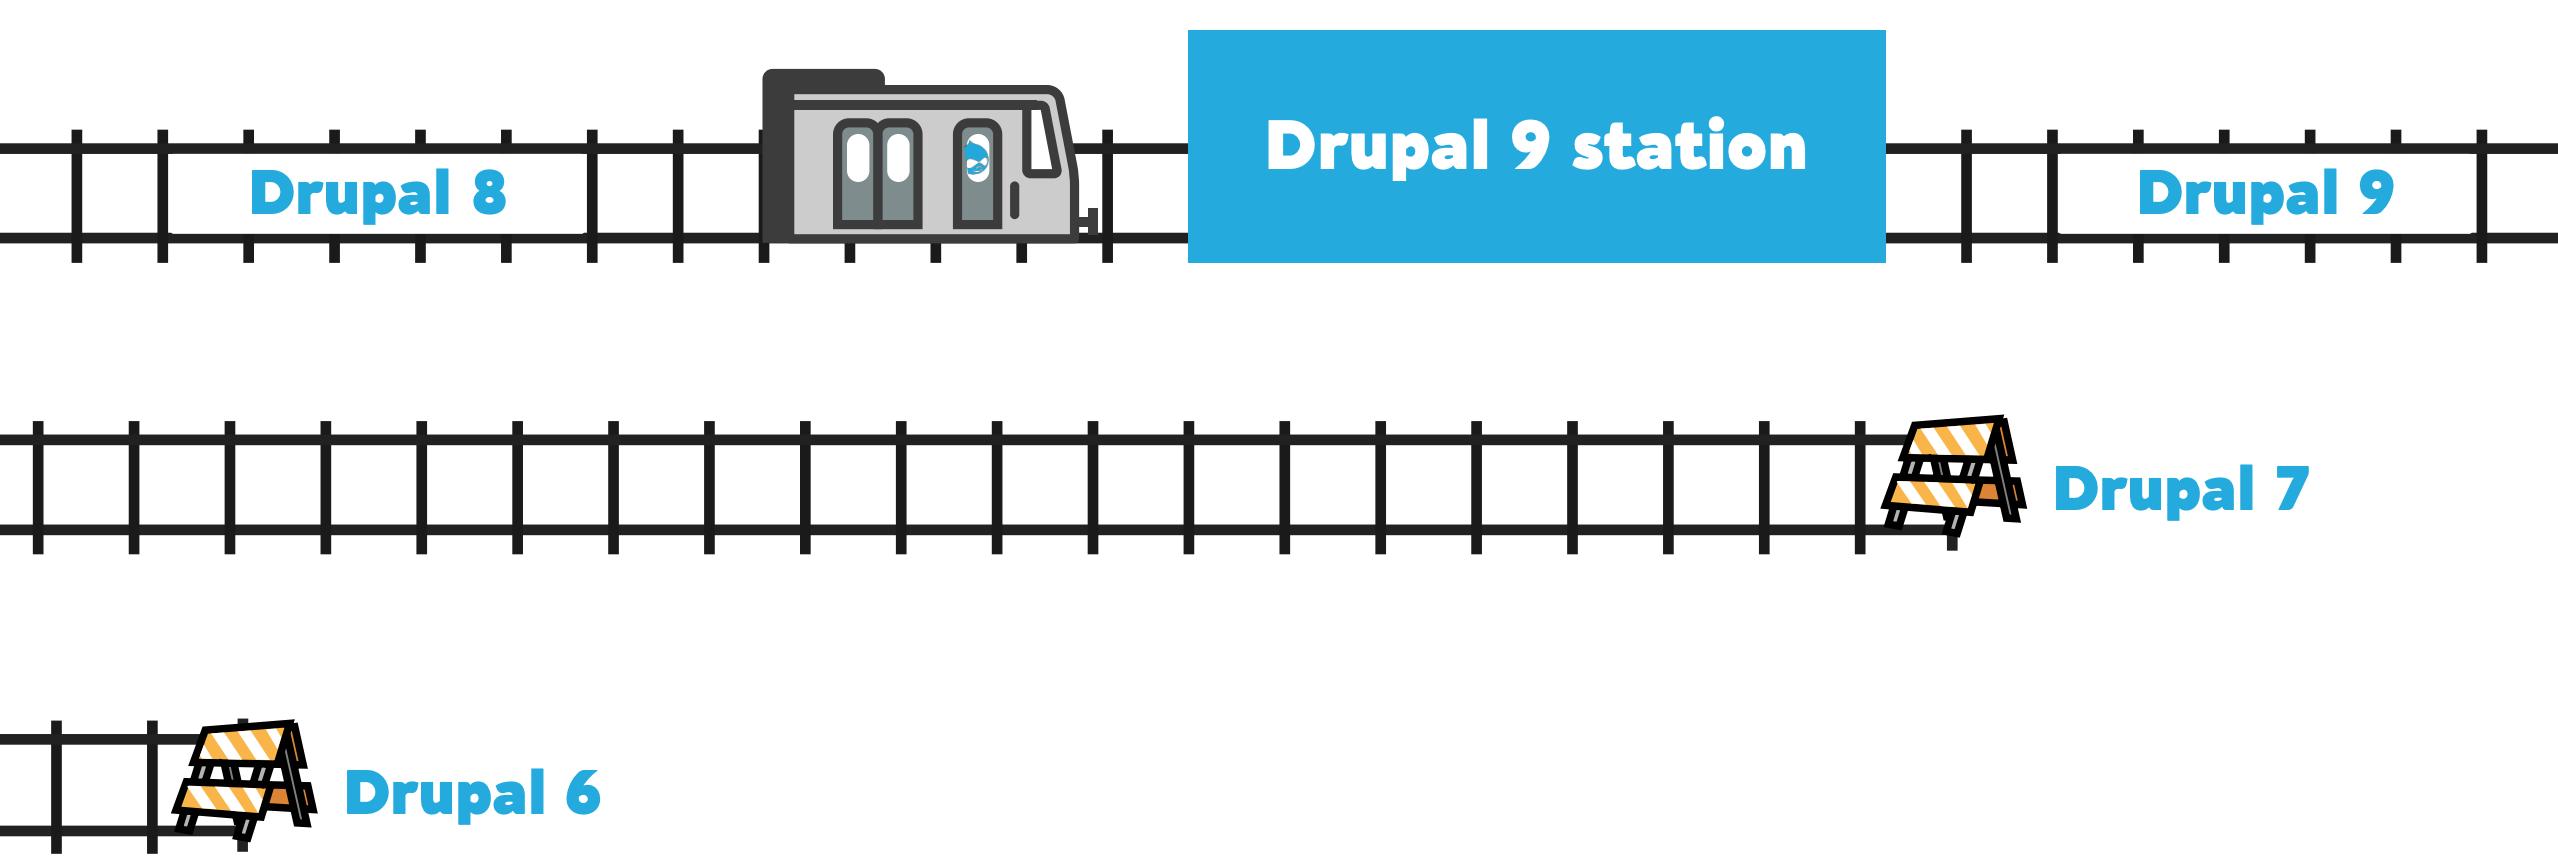 Drupal Trains